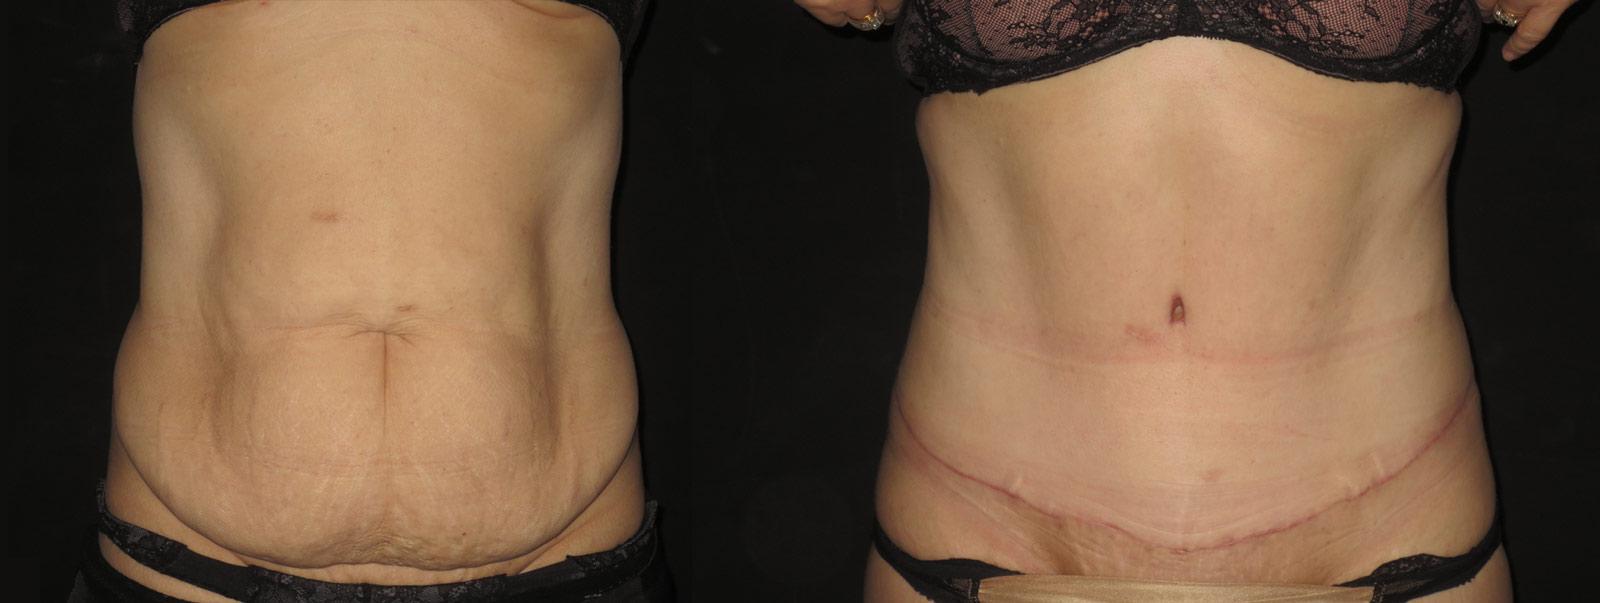 tummy tucks plastic surgeon treatments